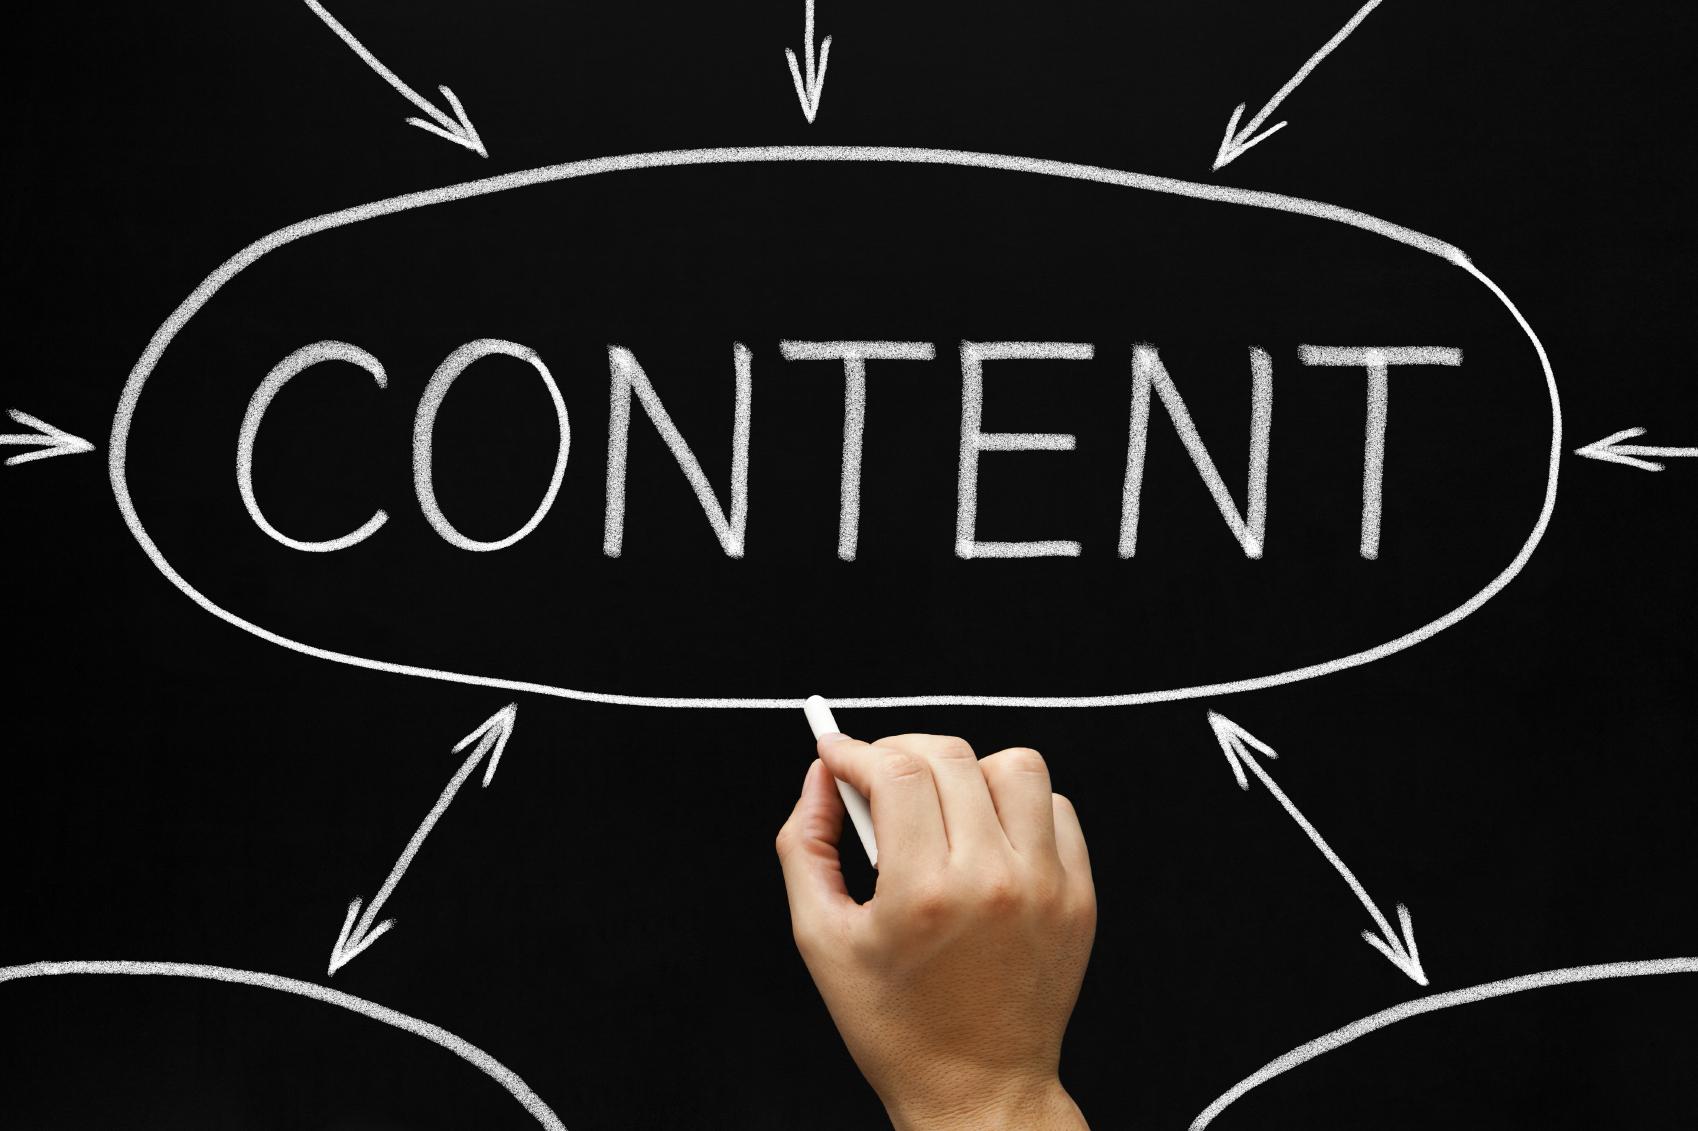 Content Flow Chart Blackboard